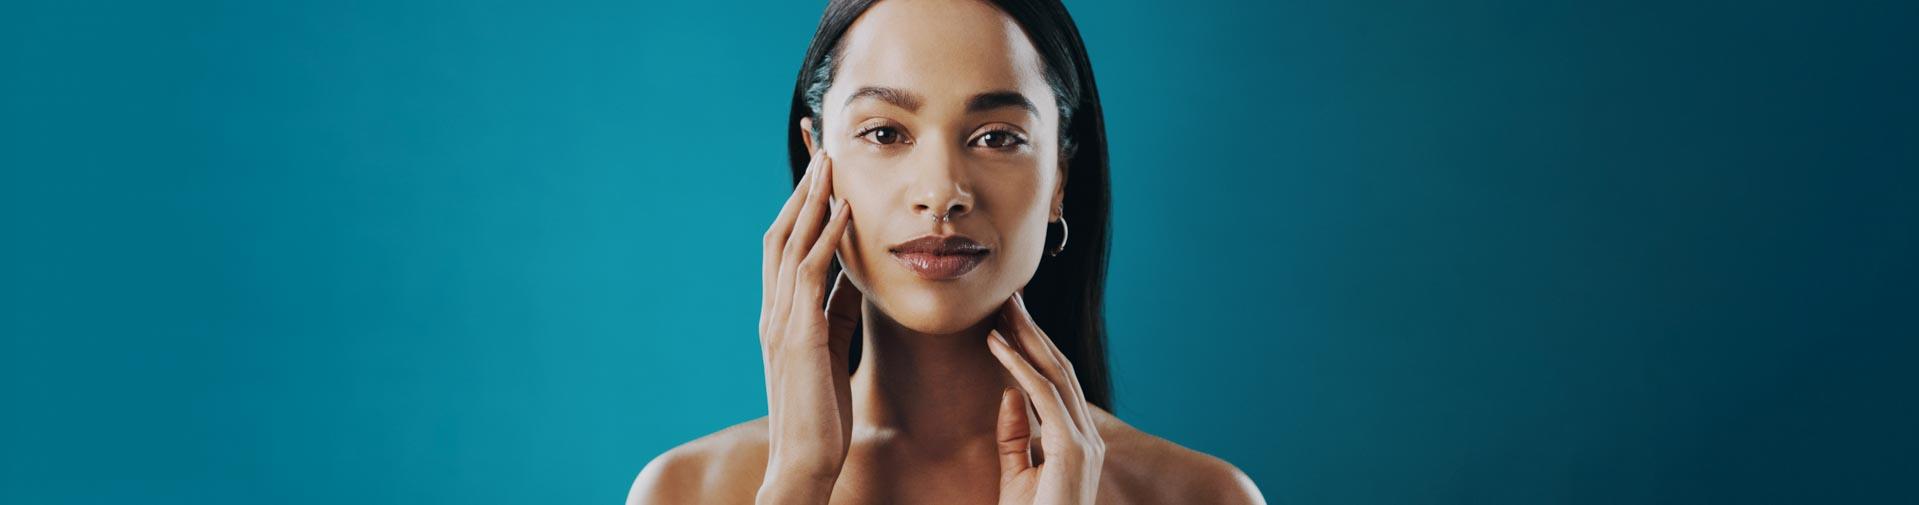 Palo Alto Laser & Skin Care